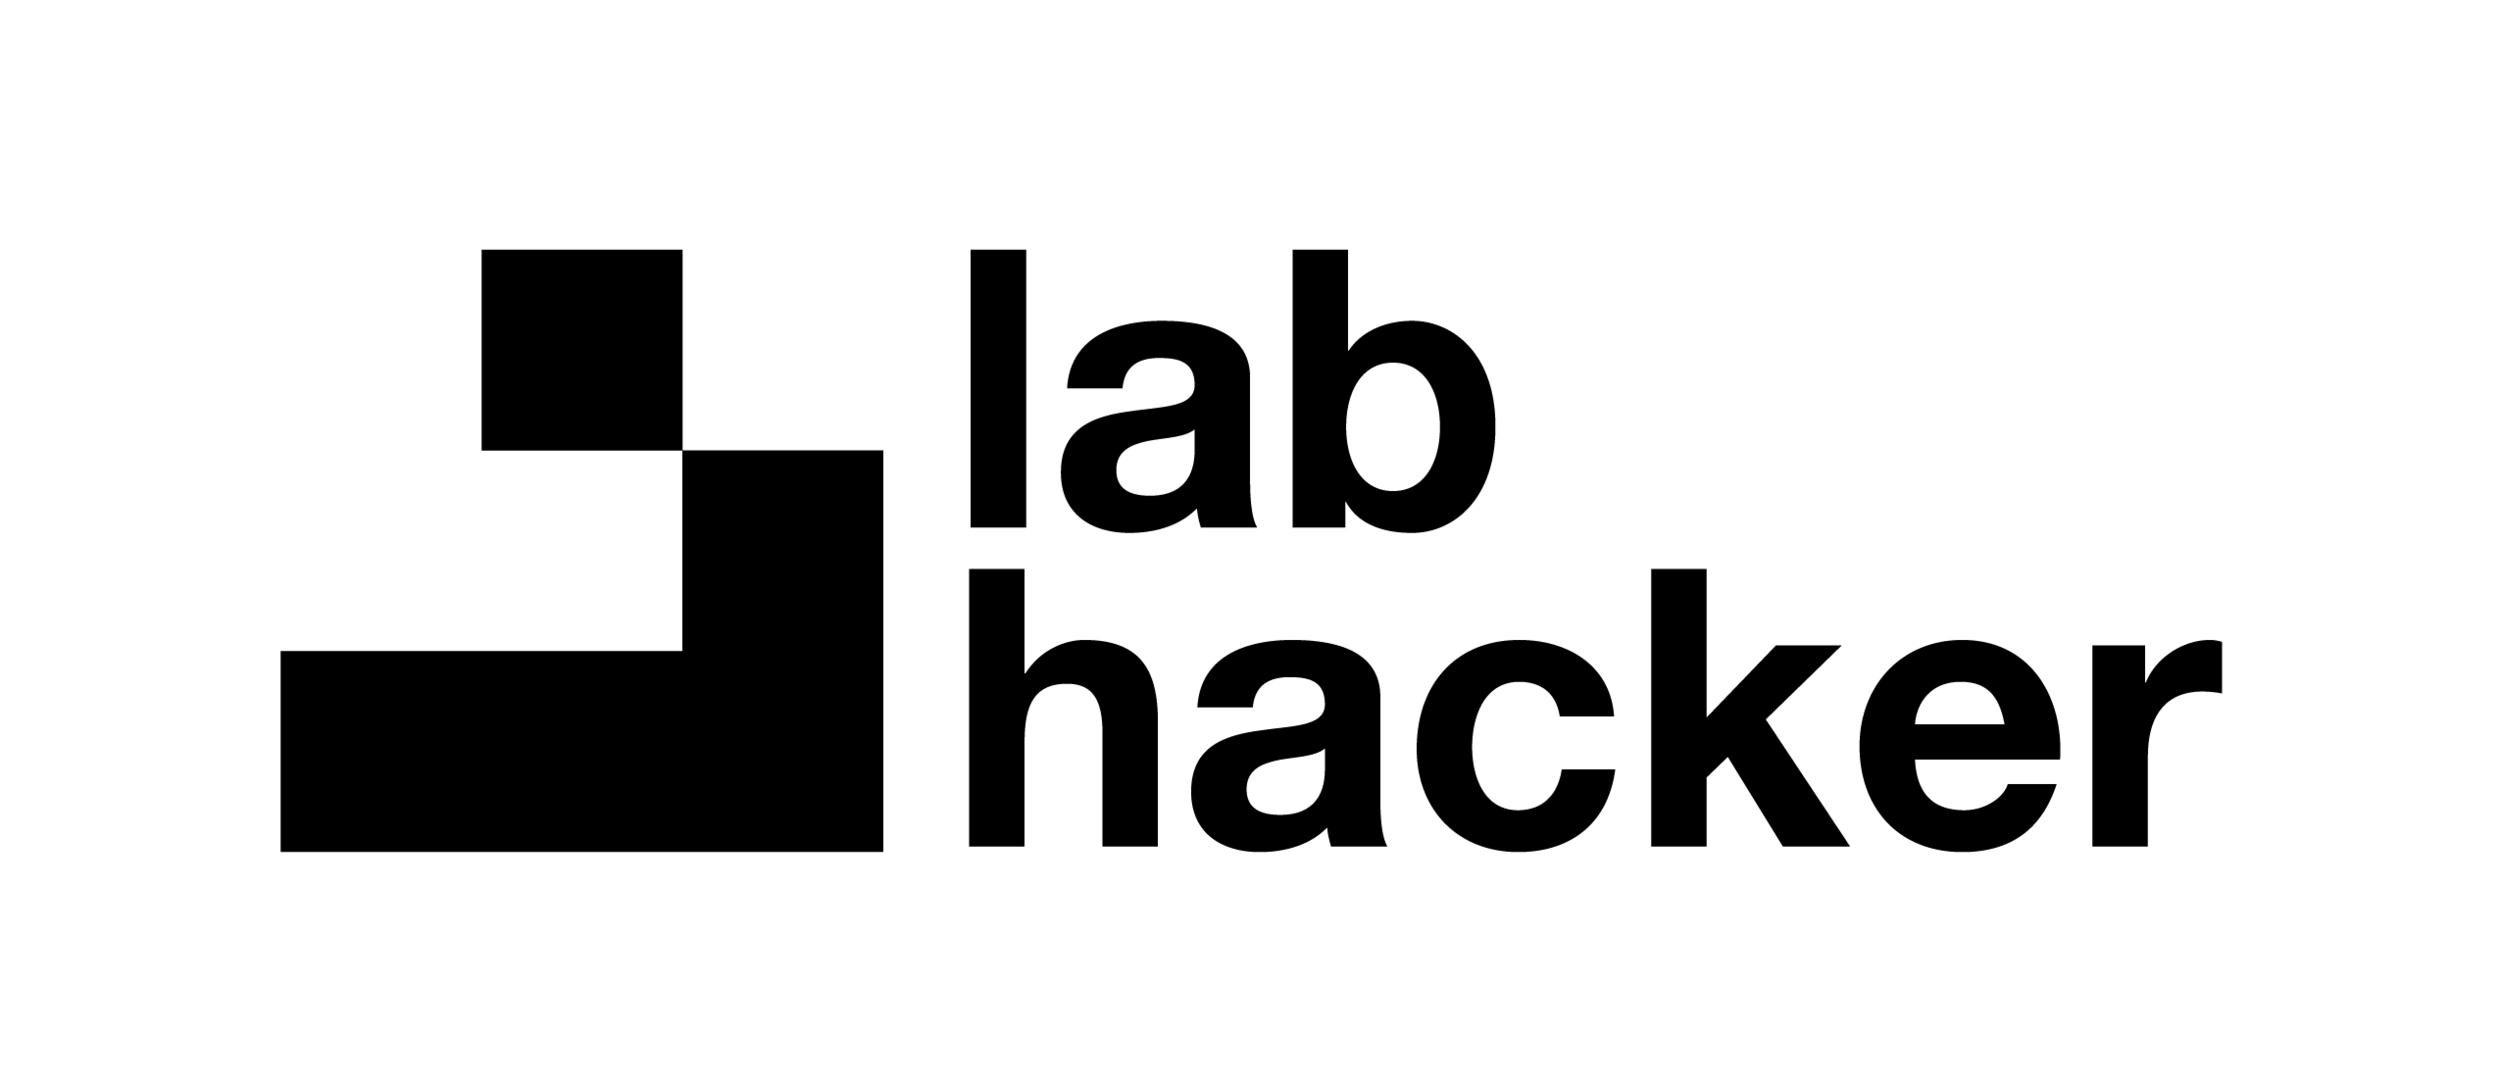 logo-lab-hacker-tamanhogrande(3).png